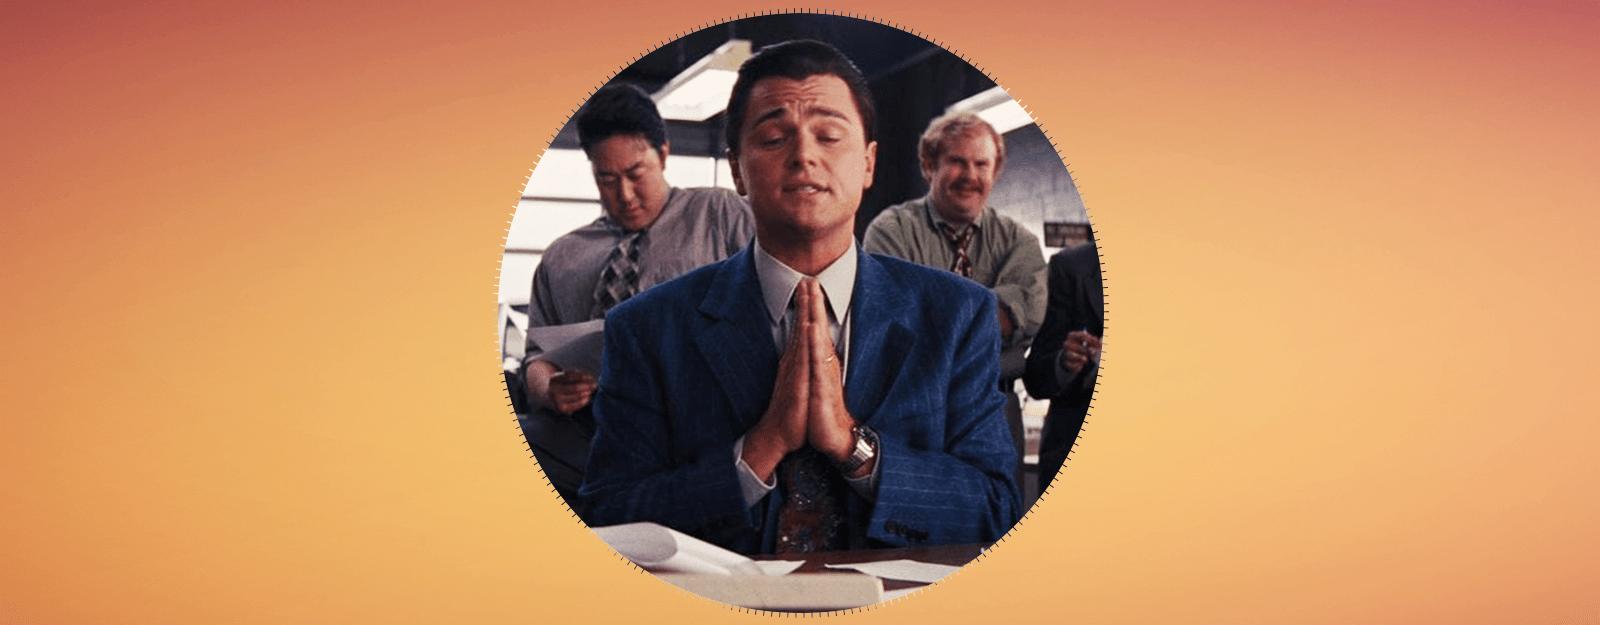 Как снизить стресс на работе?